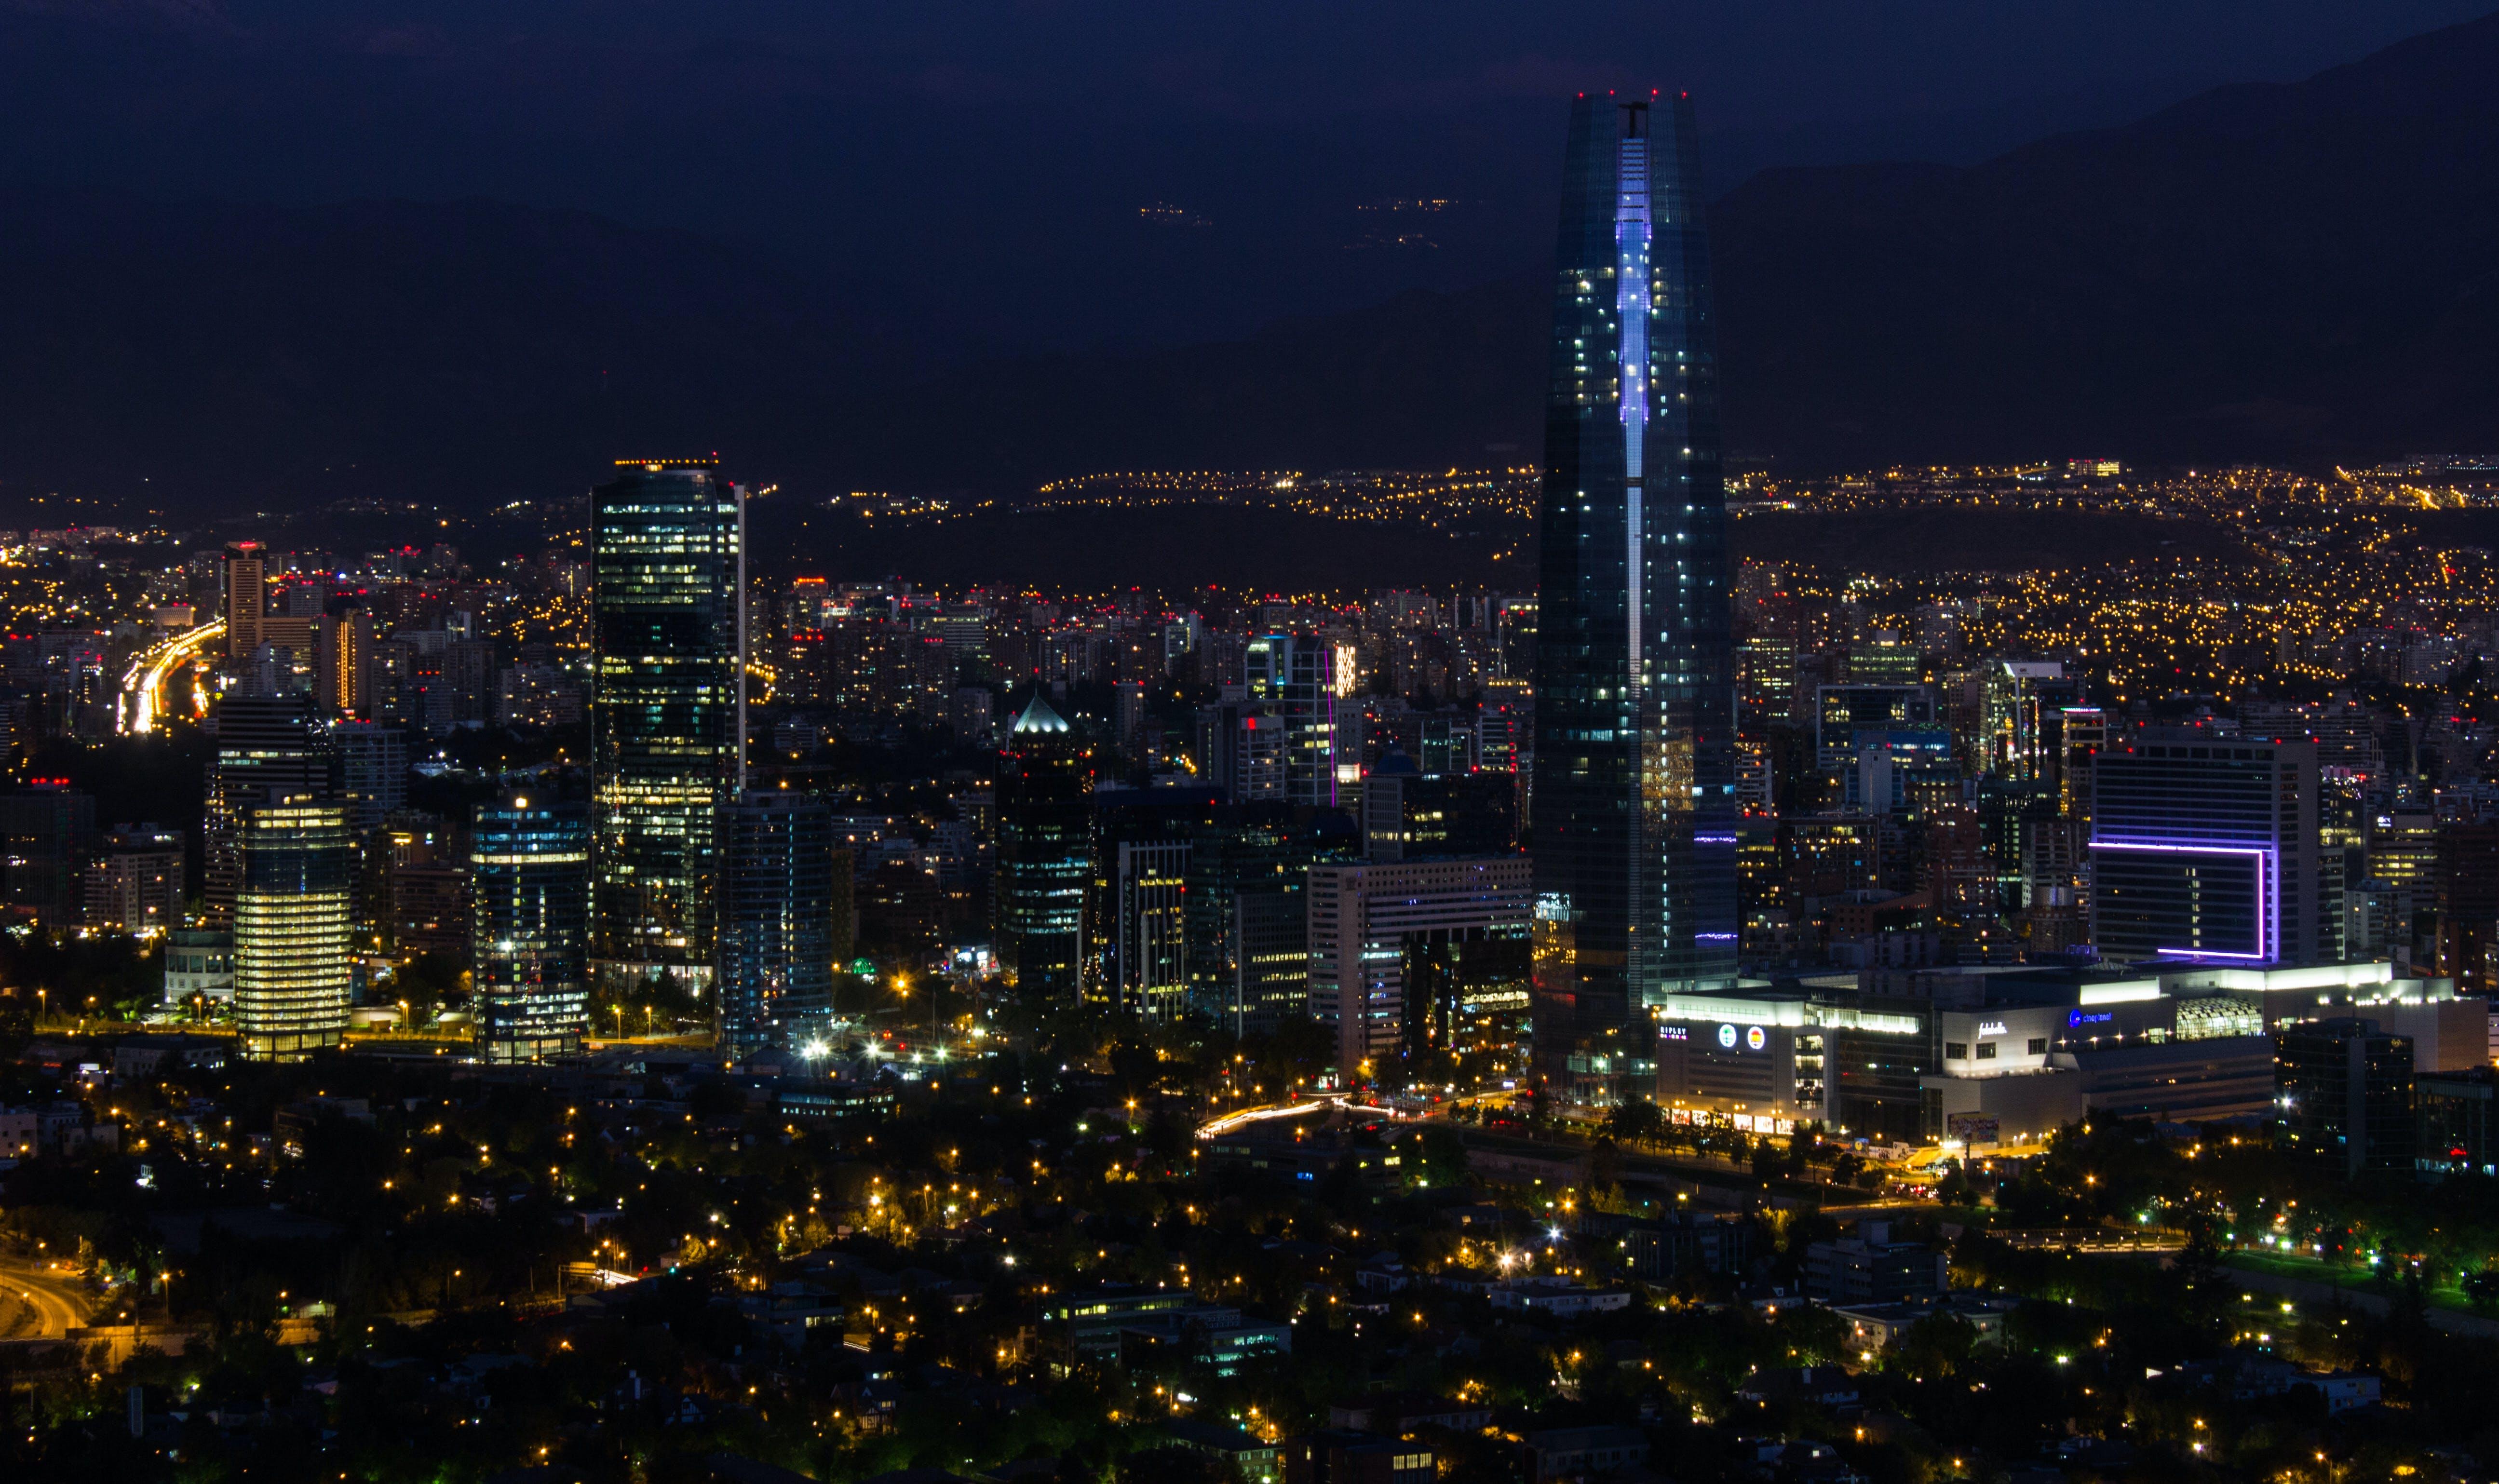 Photo of Concrete Buildings on City